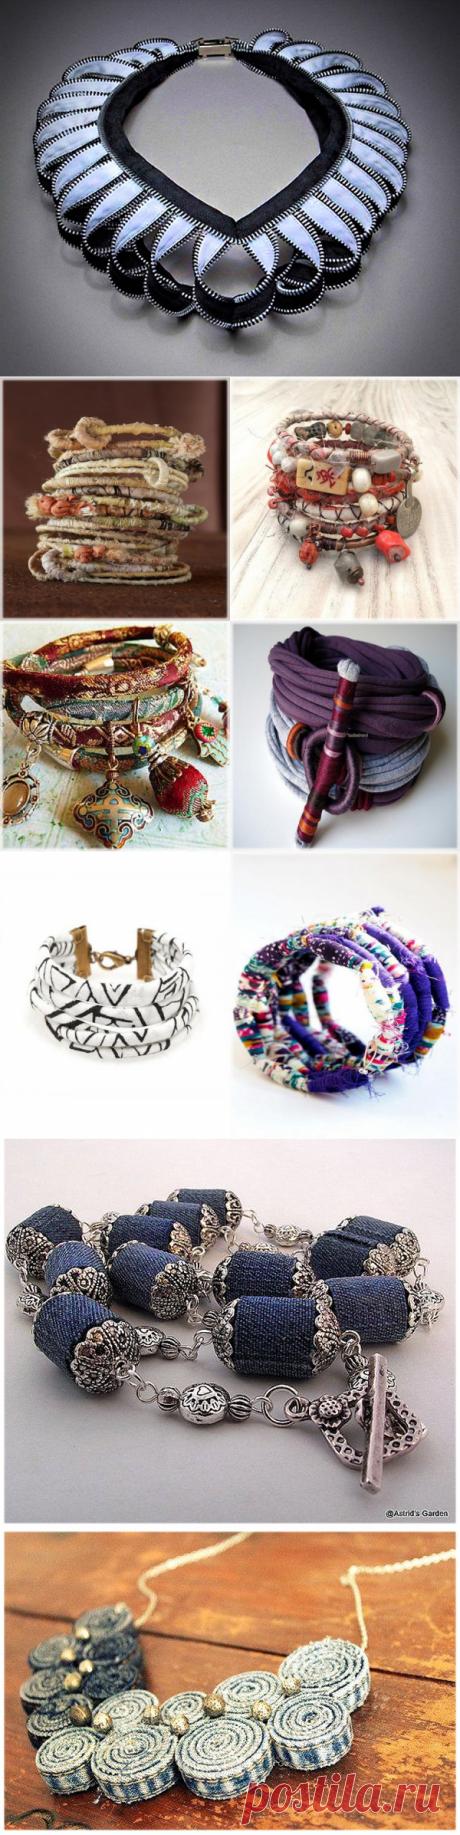 Million interesting ideas for jewelry